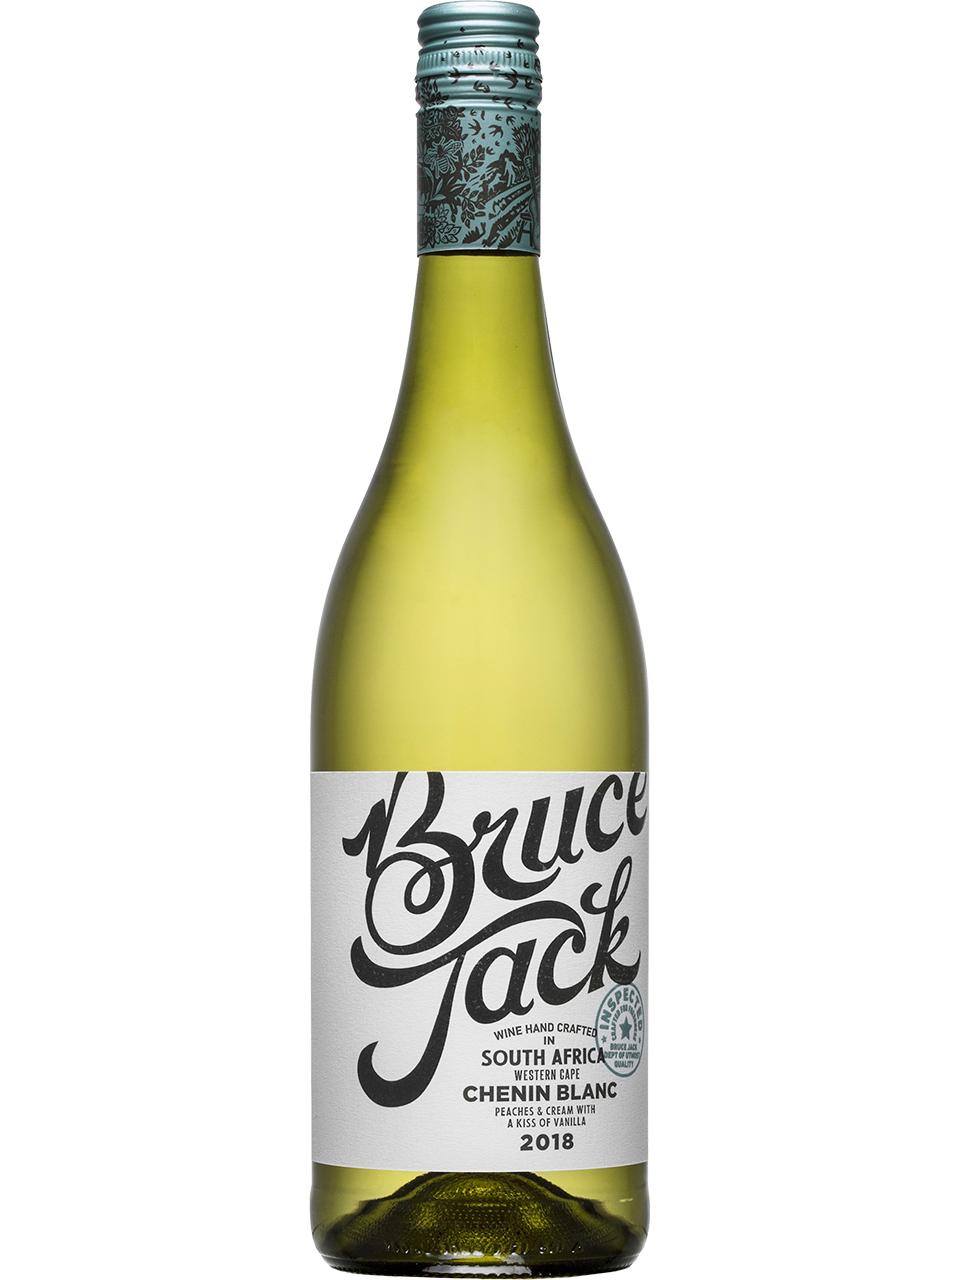 Bruce Jack Chenin Blanc